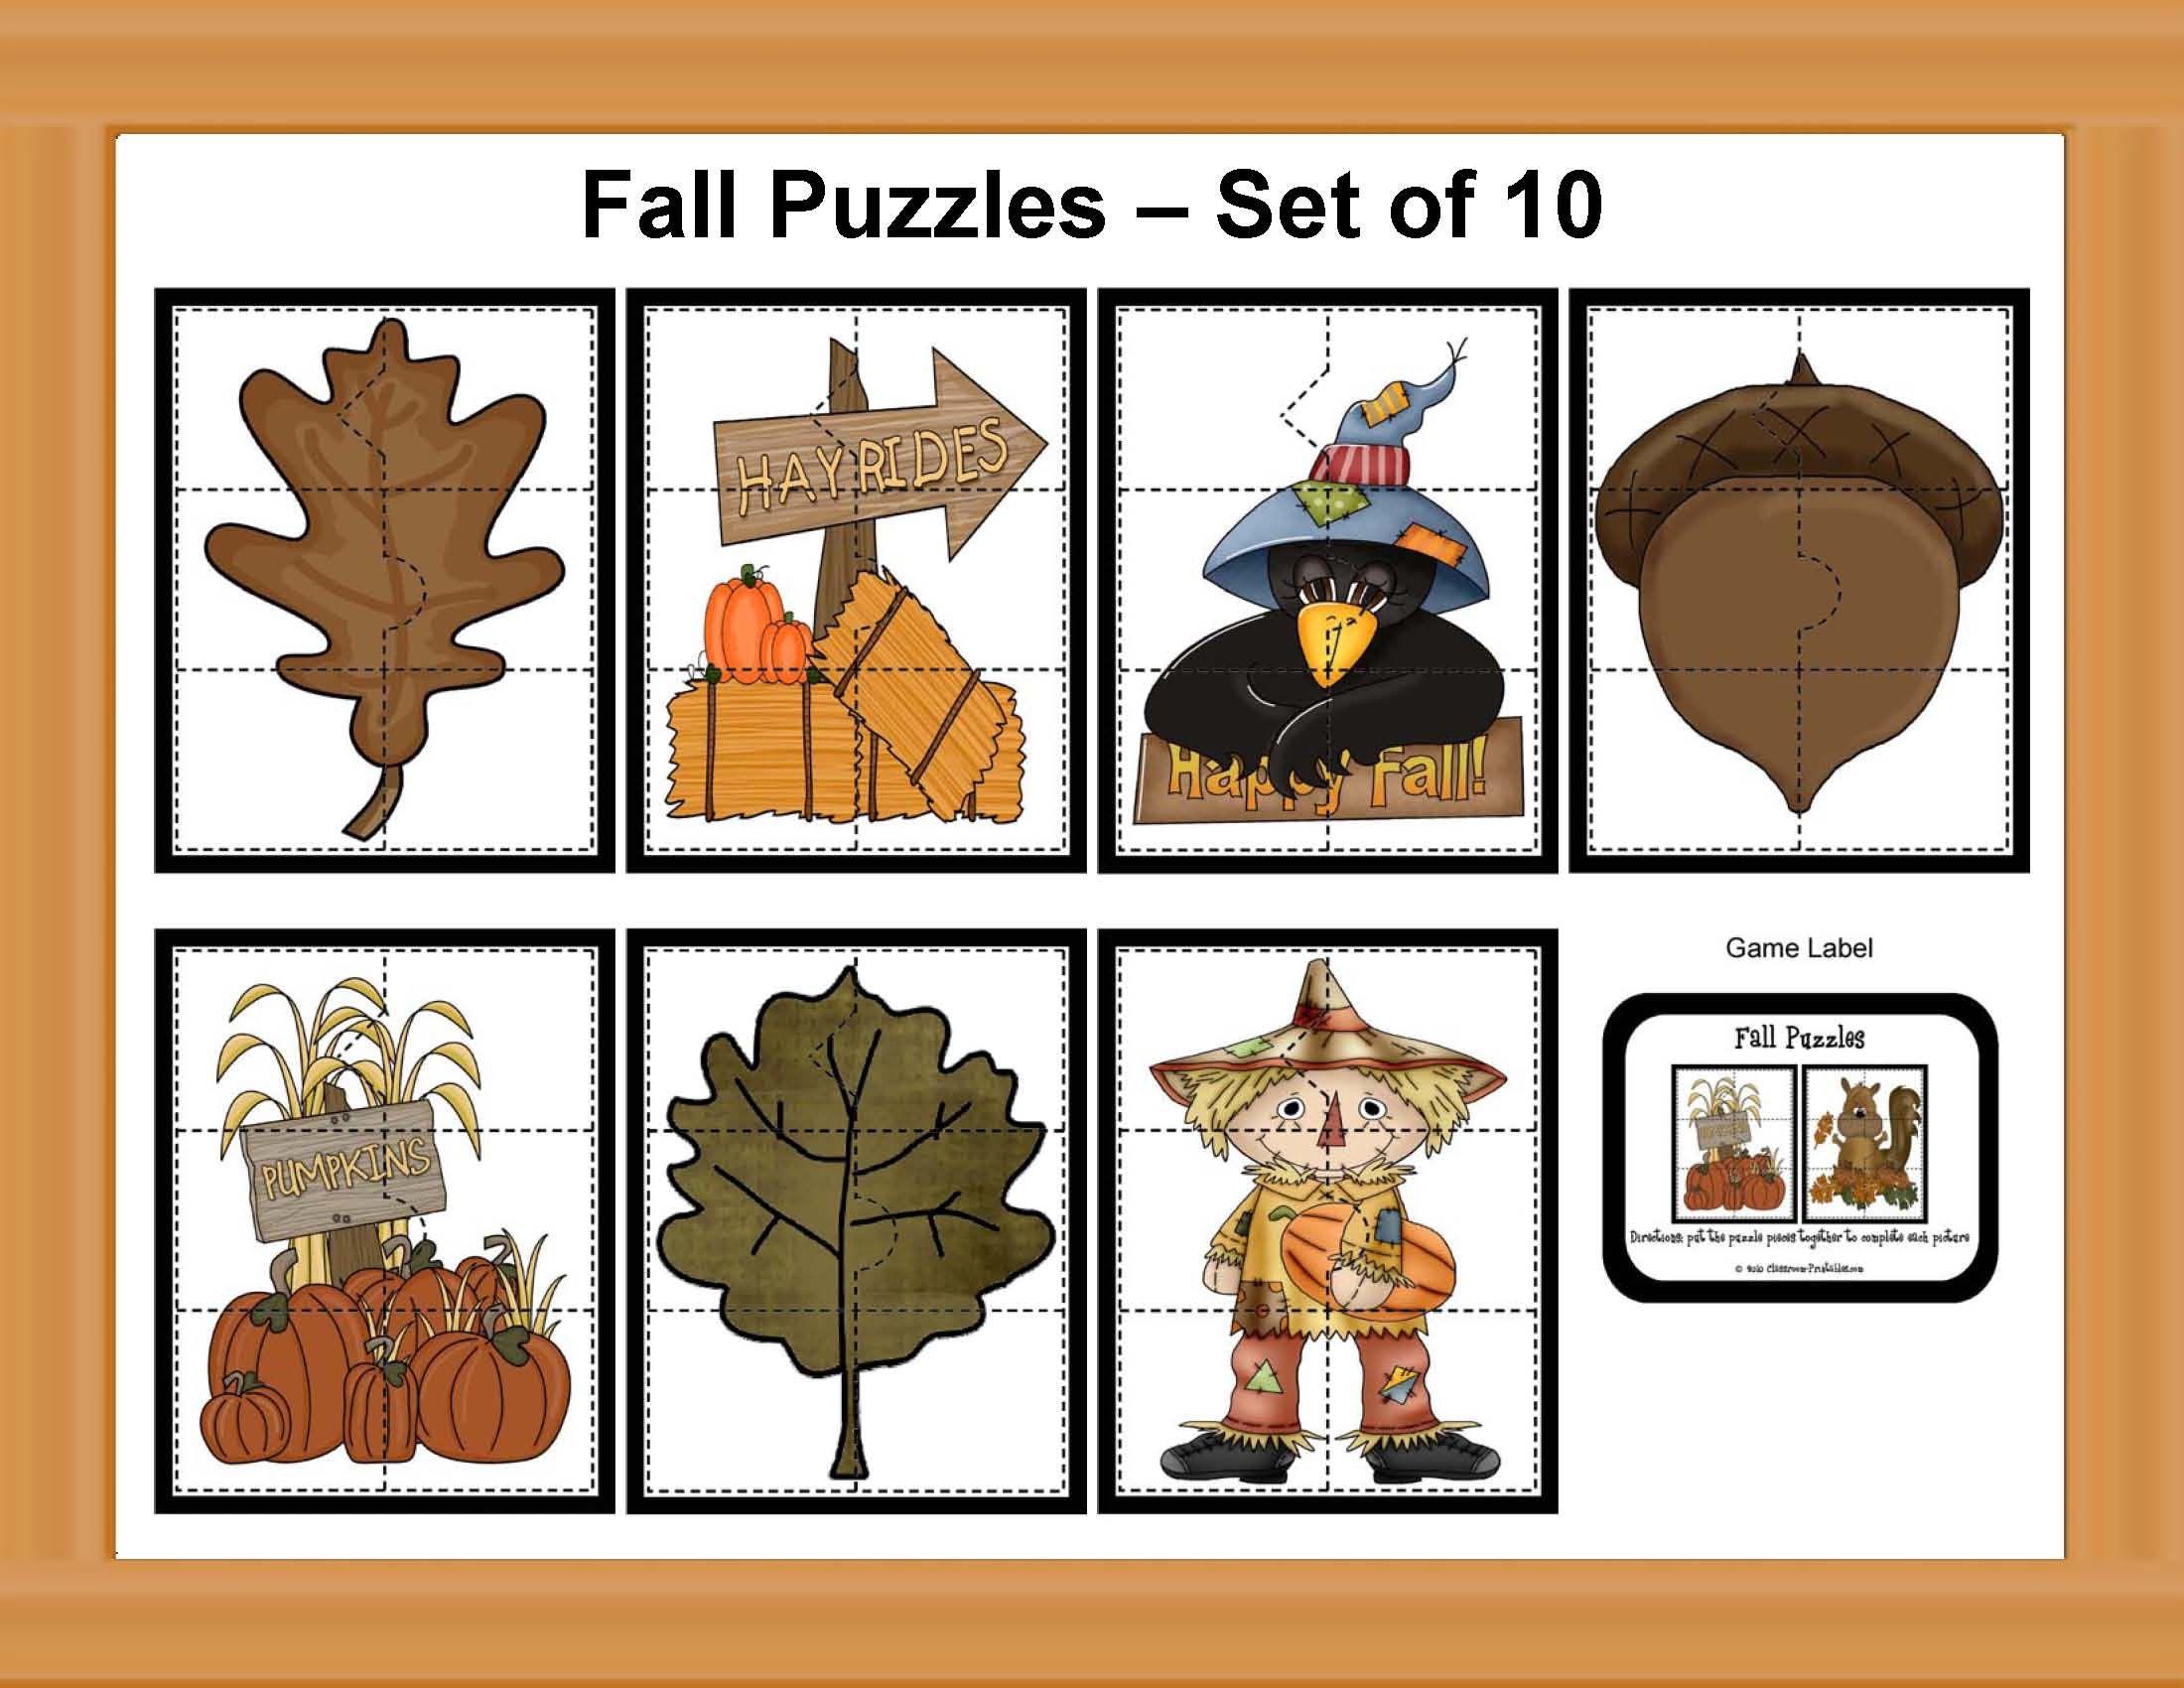 Fall Puzzle Set